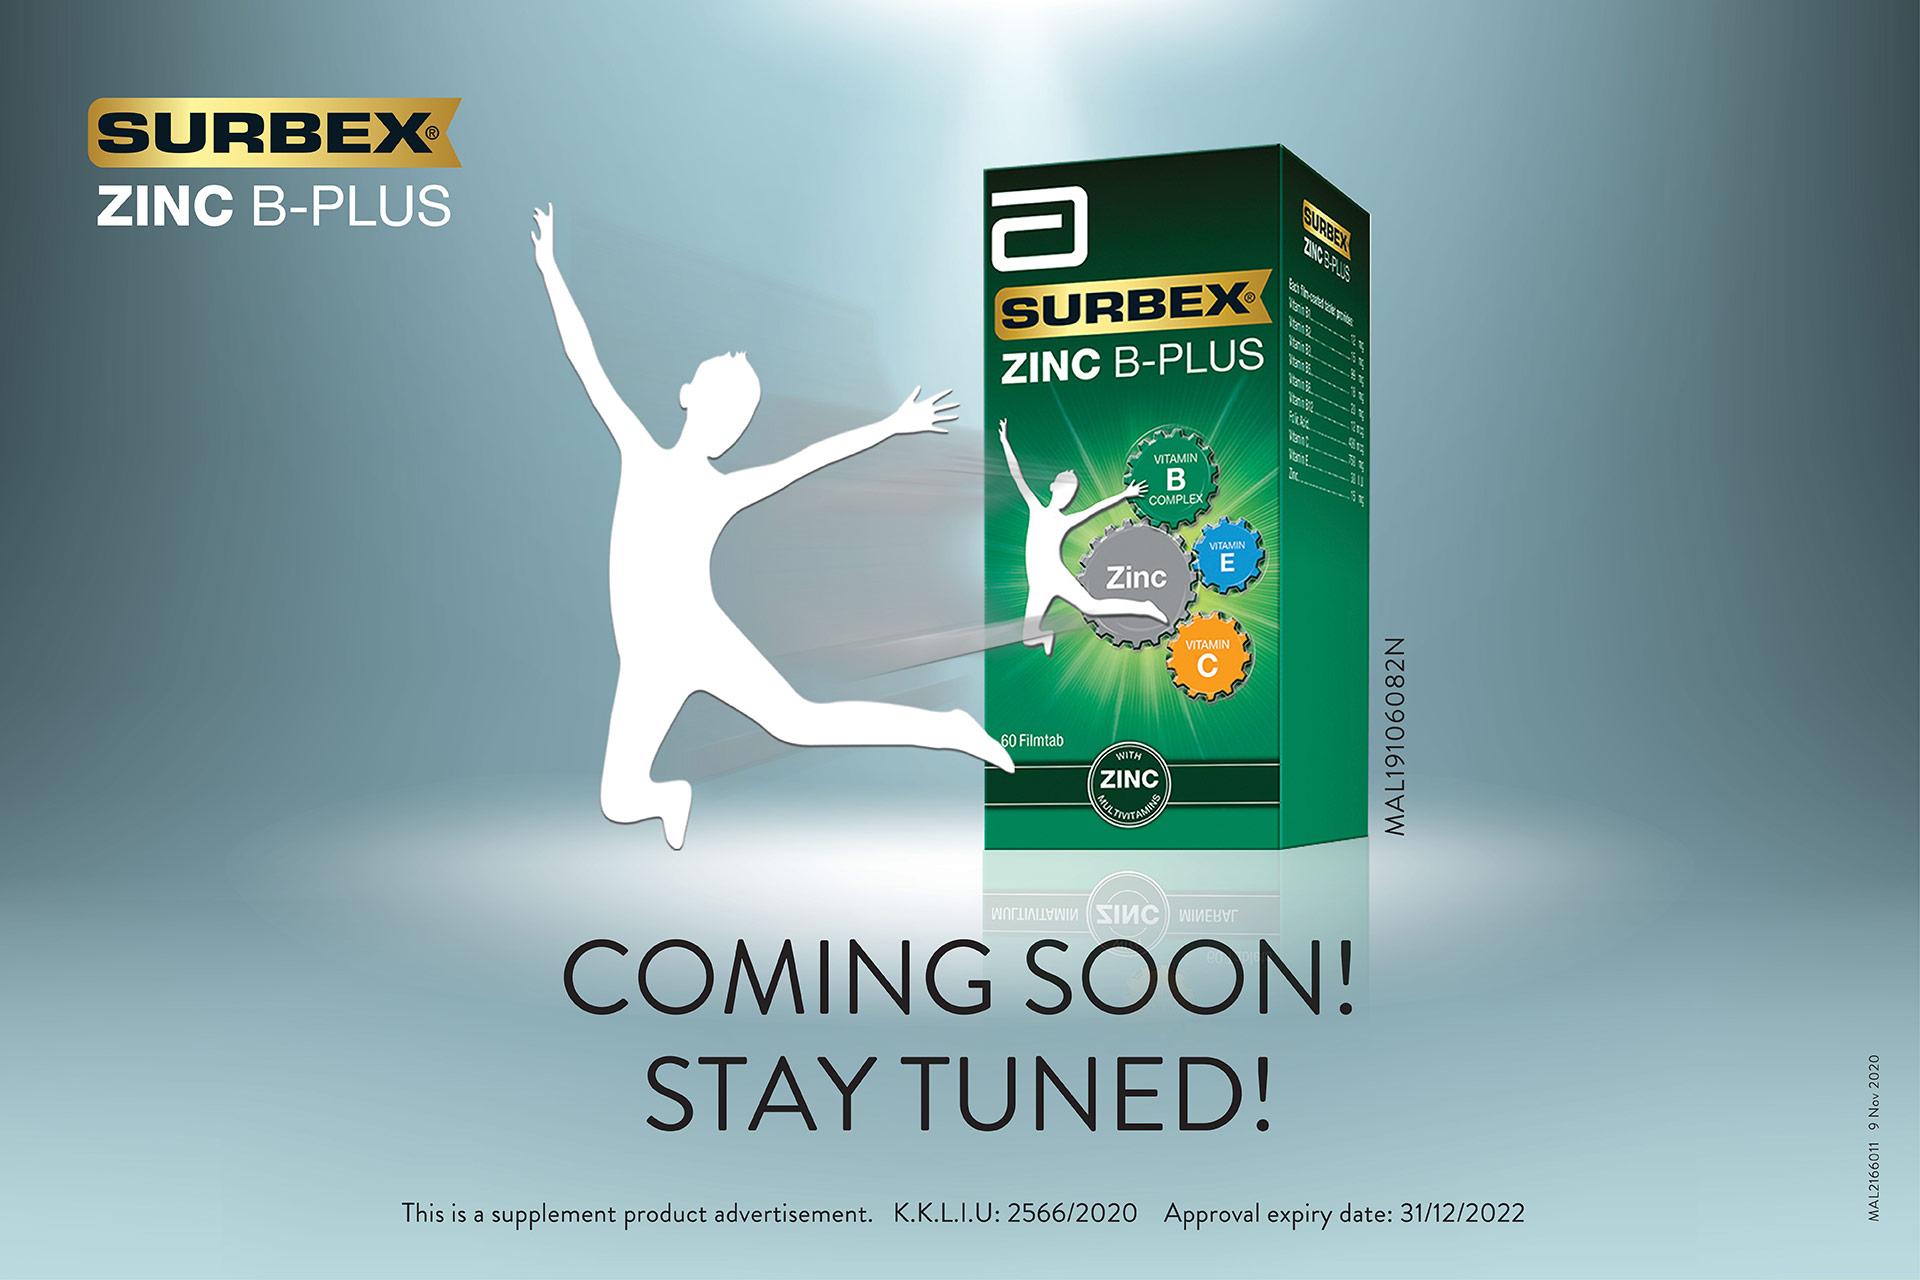 Surbex Zinc B-Plus Teaser